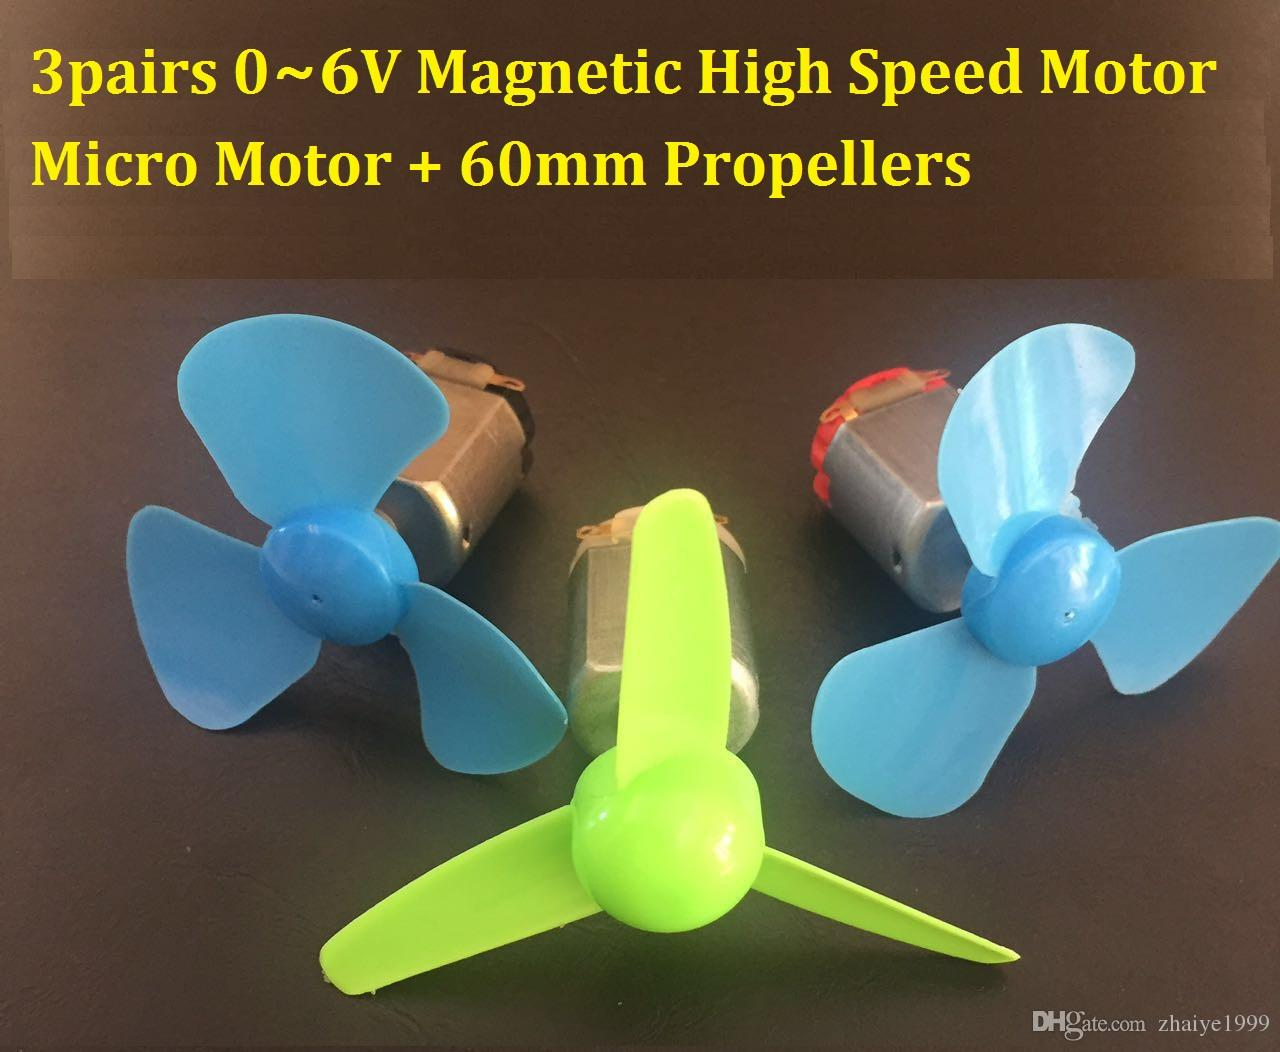 3 쌍 0-6V 소형 DC 고속 모터 + 3 60mm 팬 블레이드